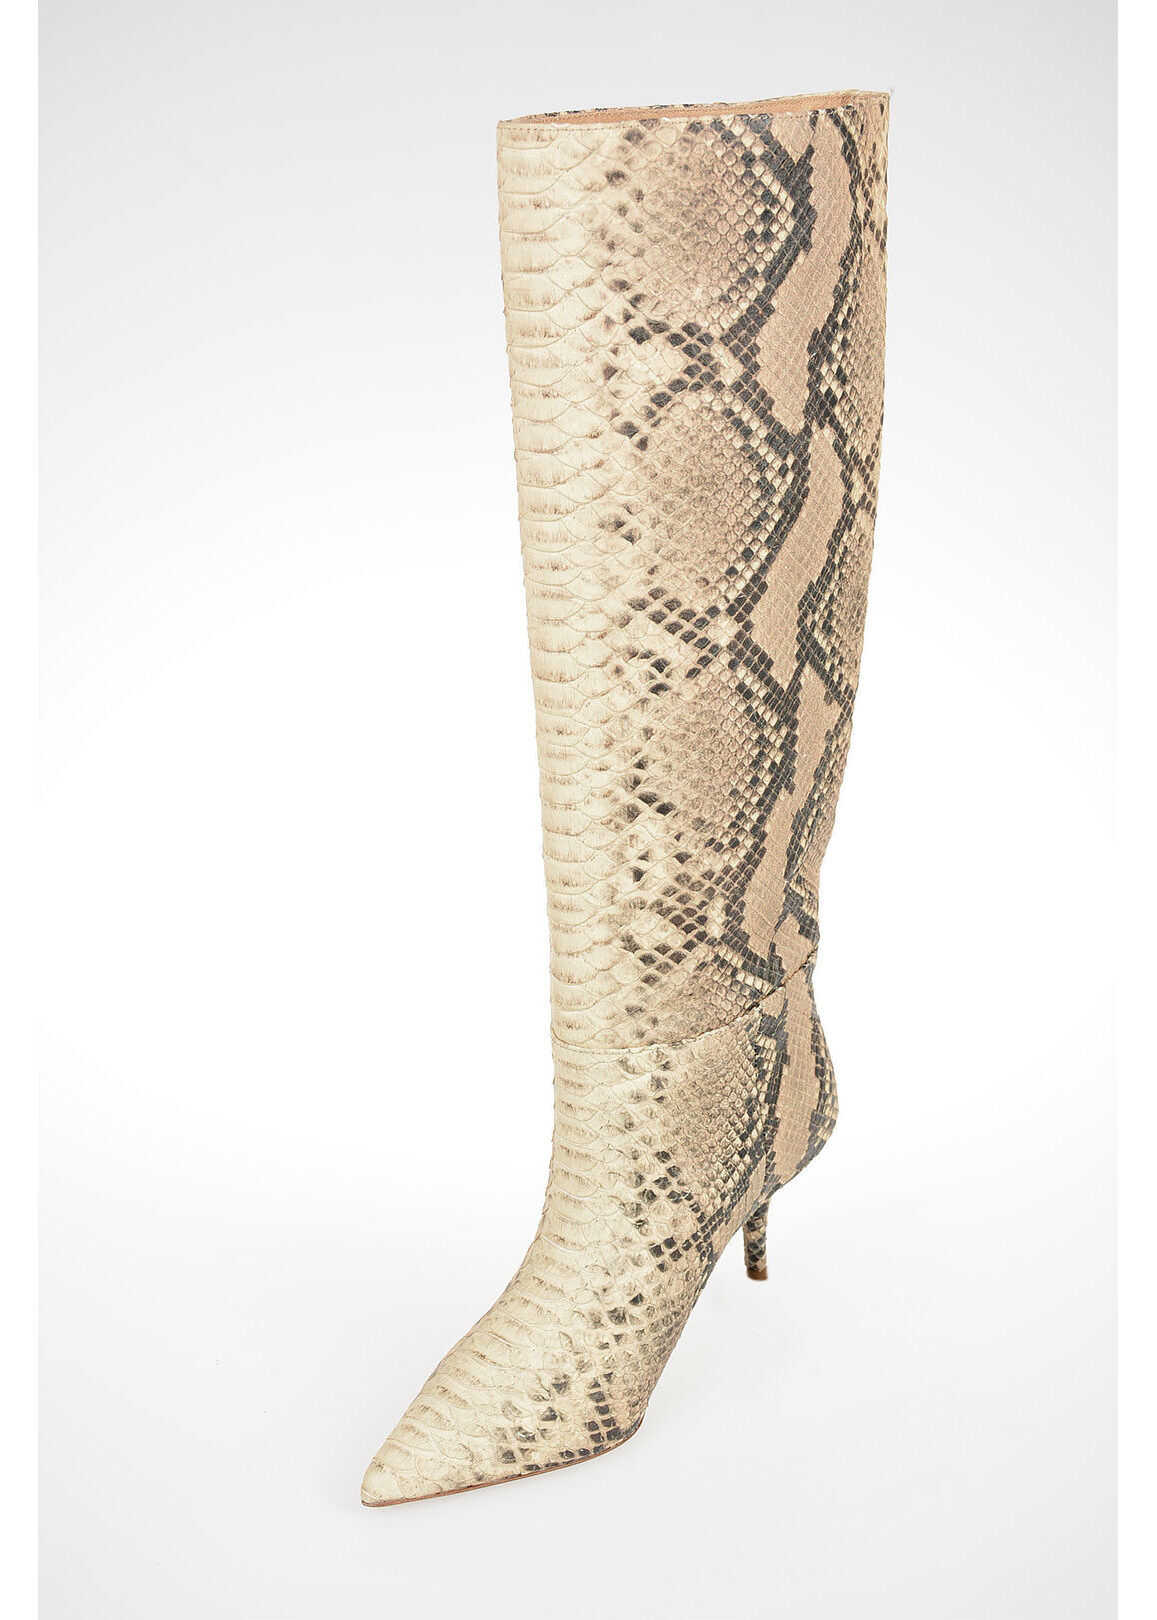 Yeezy SEASON 7 7cm Python Embossed Leather ROCCIA Boots BEIGE imagine b-mall.ro